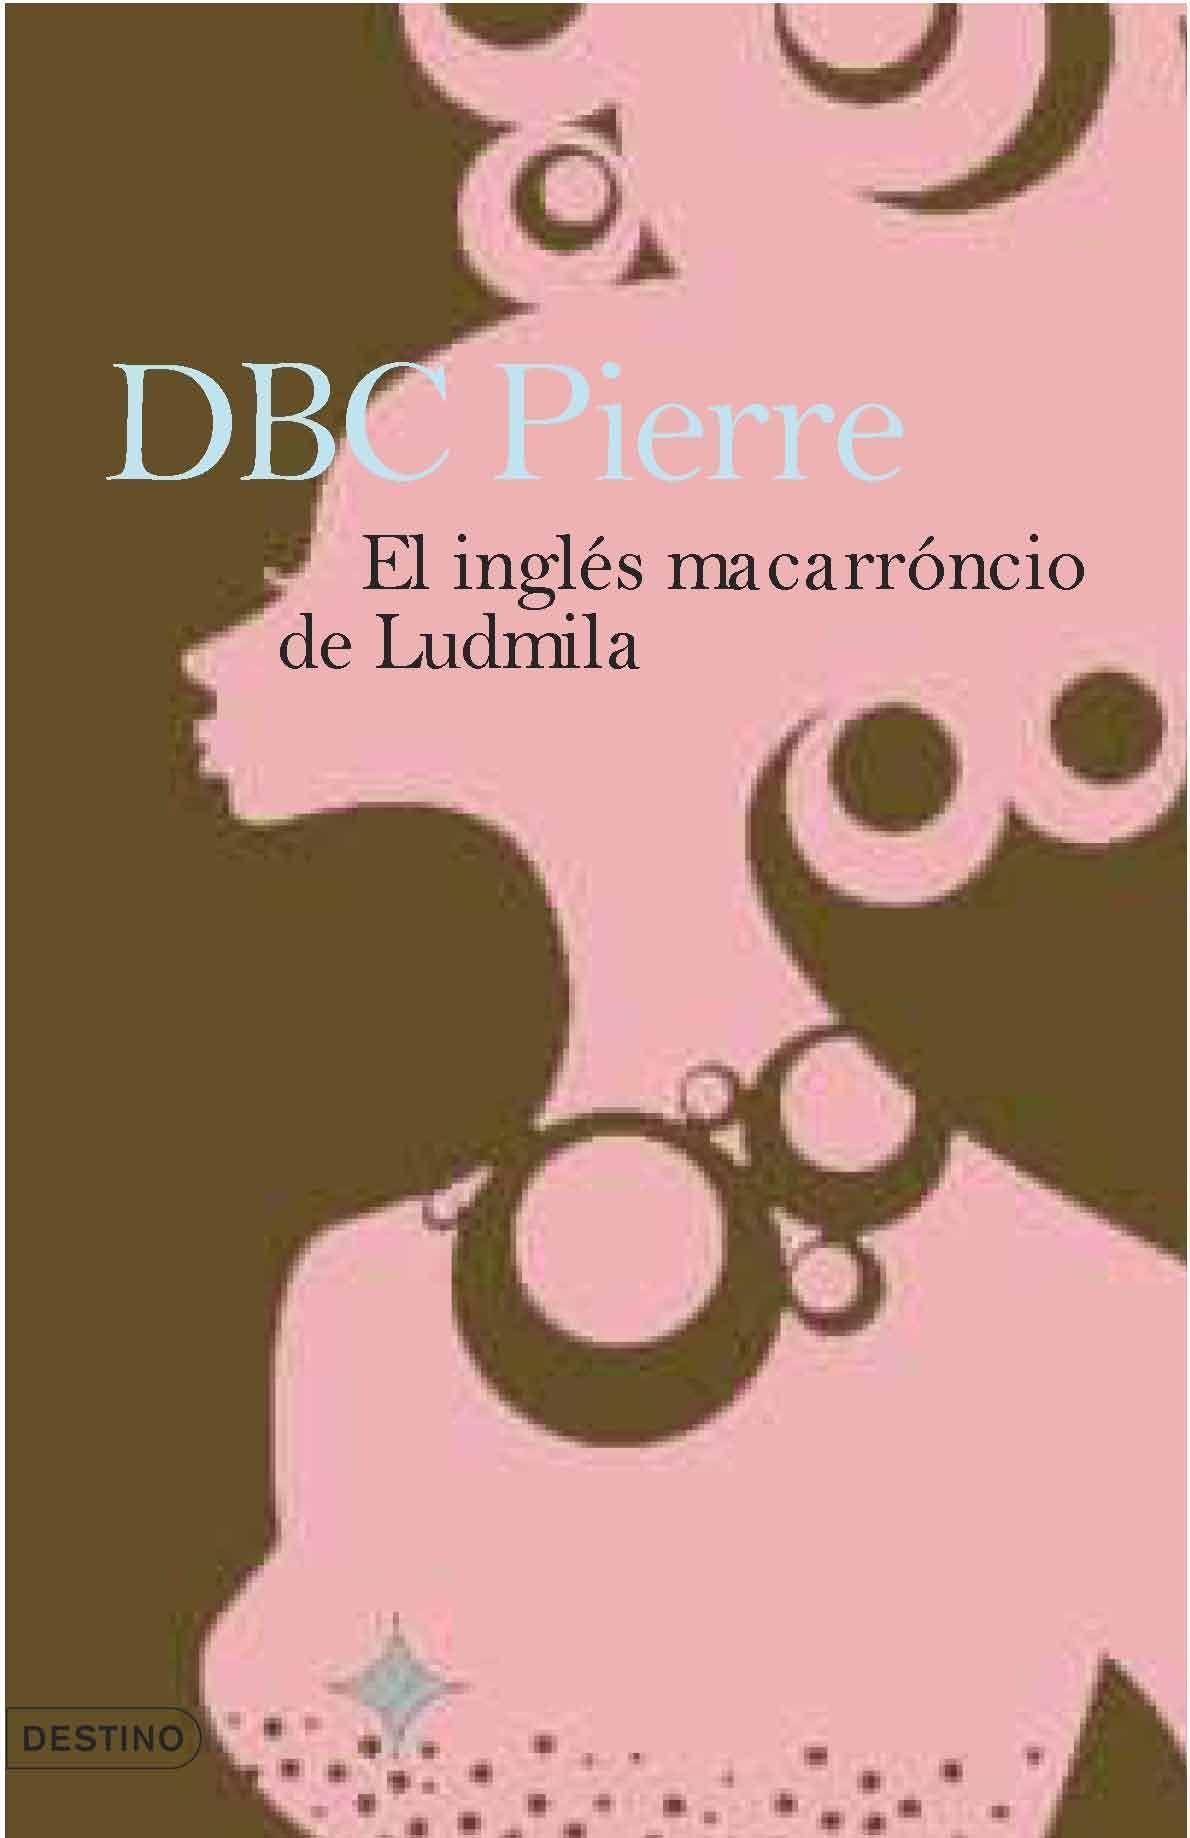 El Ingles Macarronico De Ludmila por Dbc Pierre